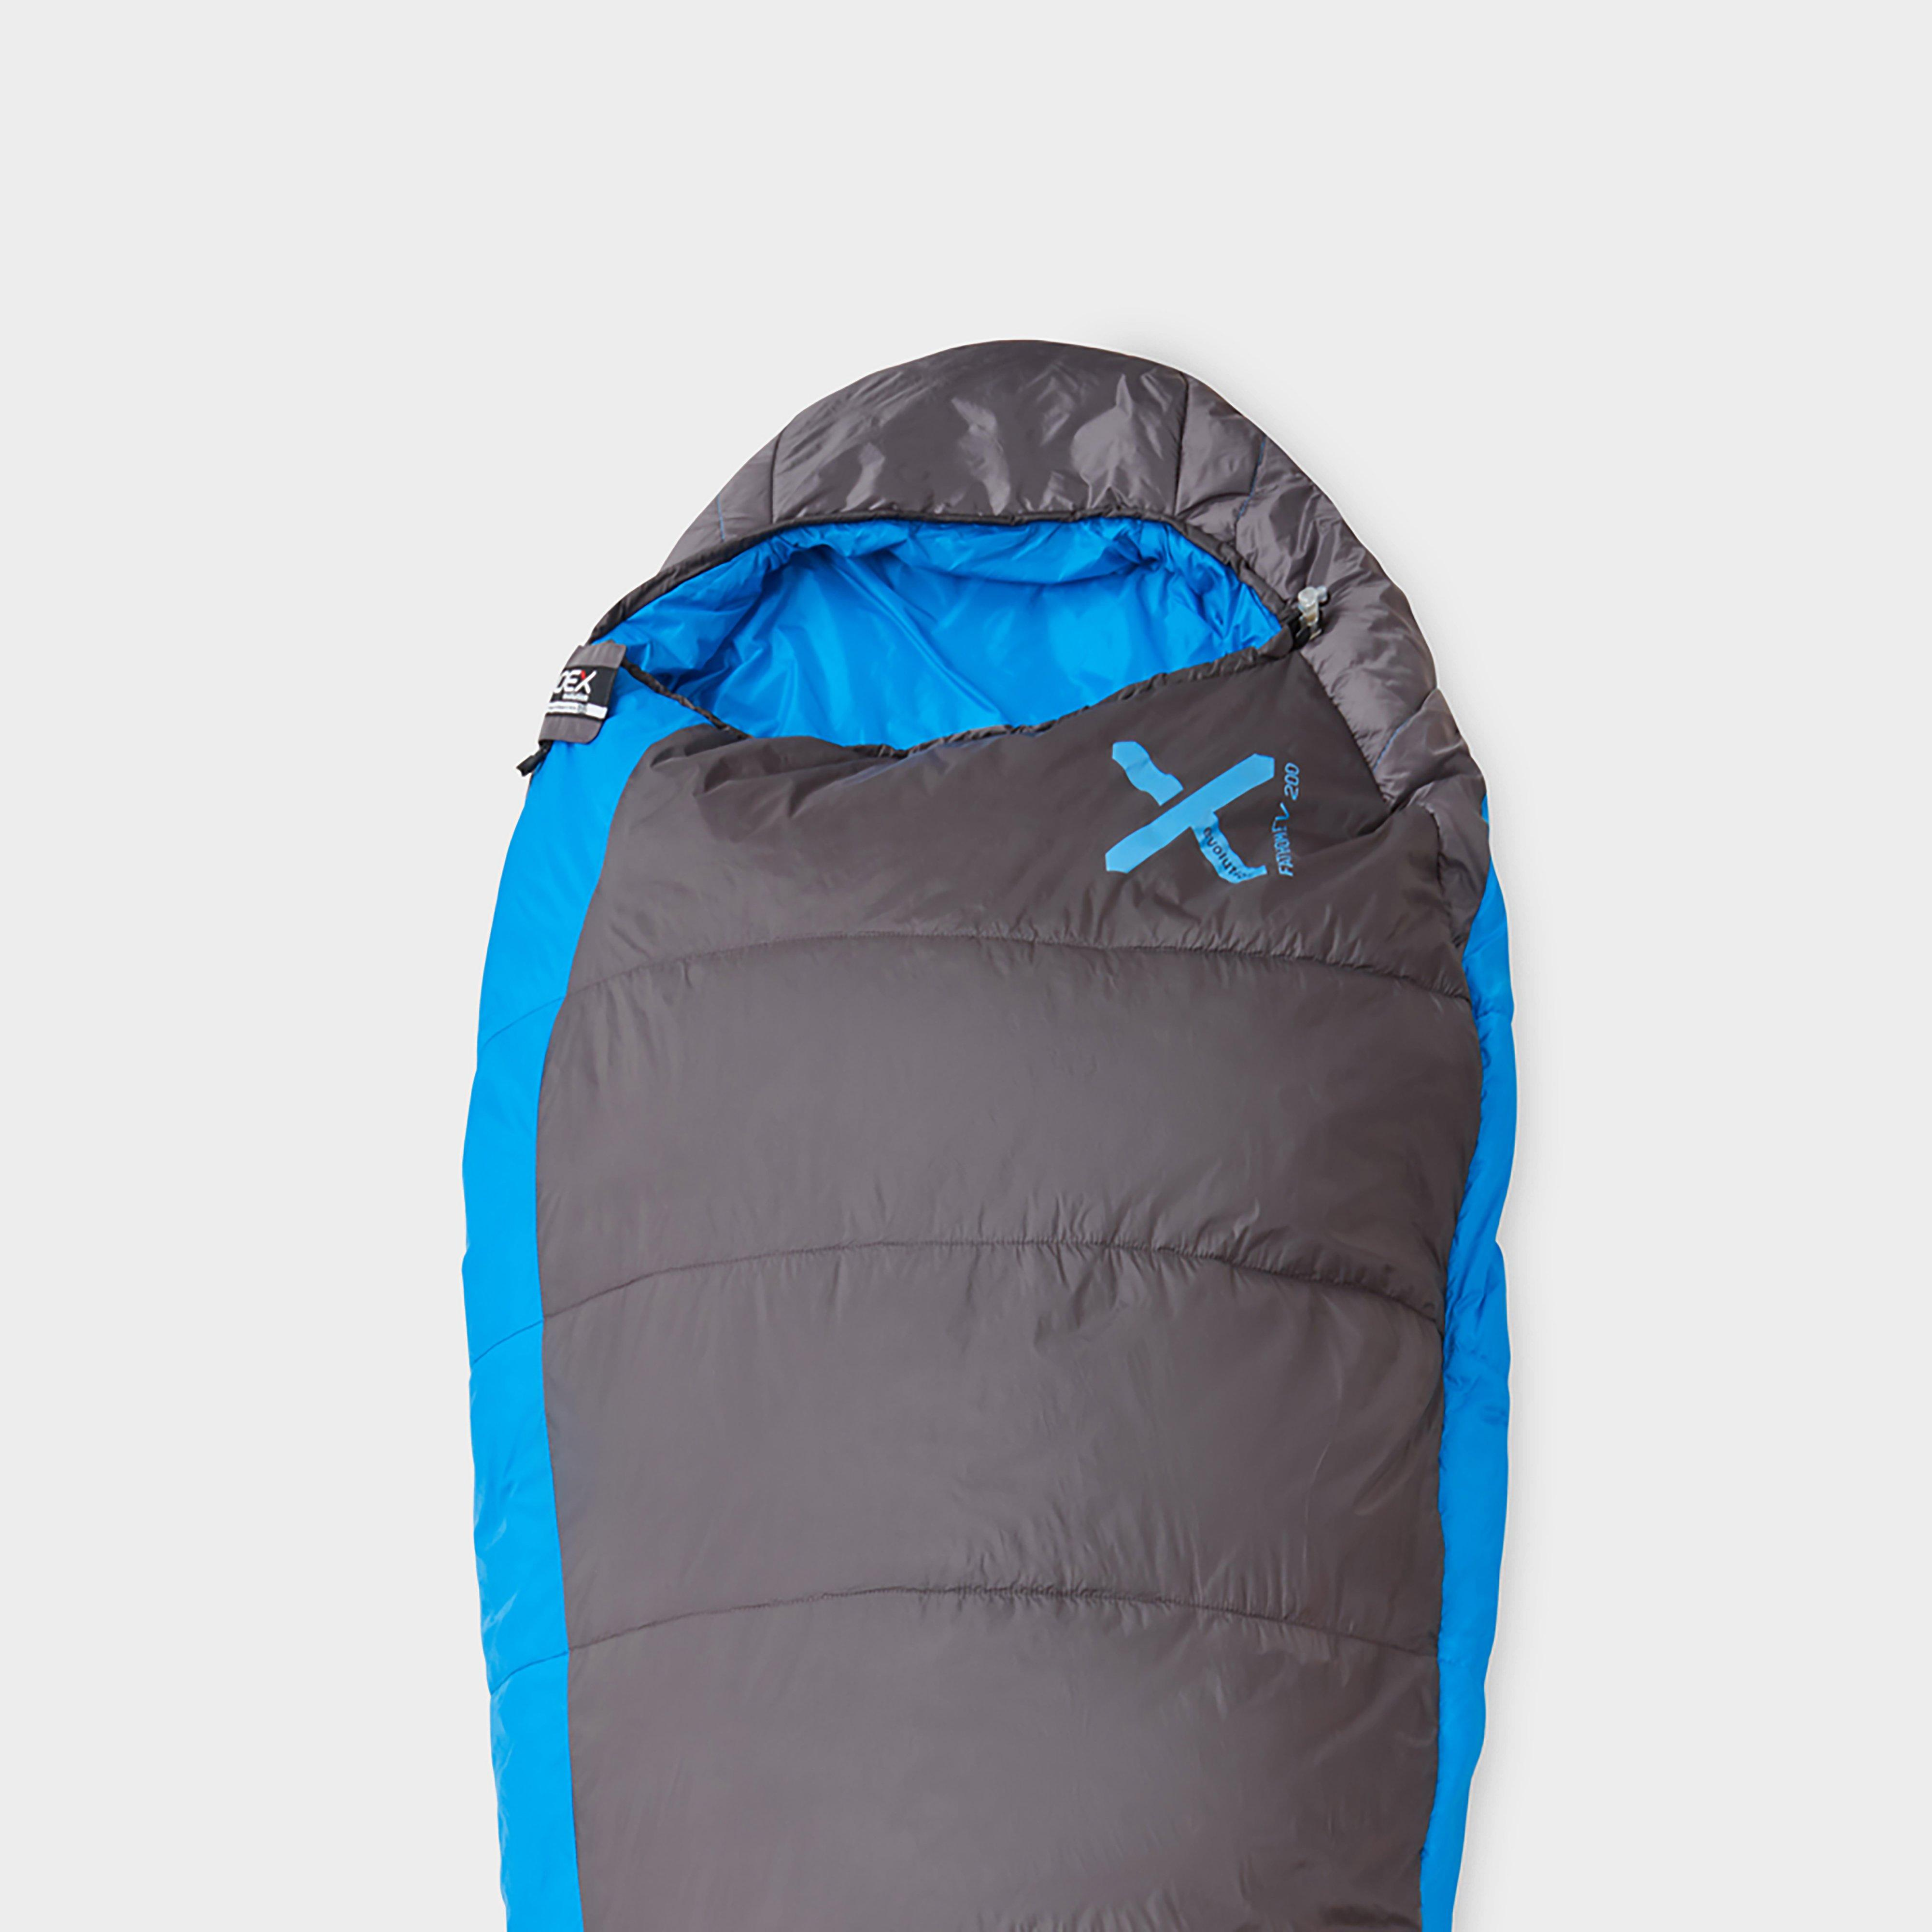 OEX Fathom EV 200 Sleeping Bag